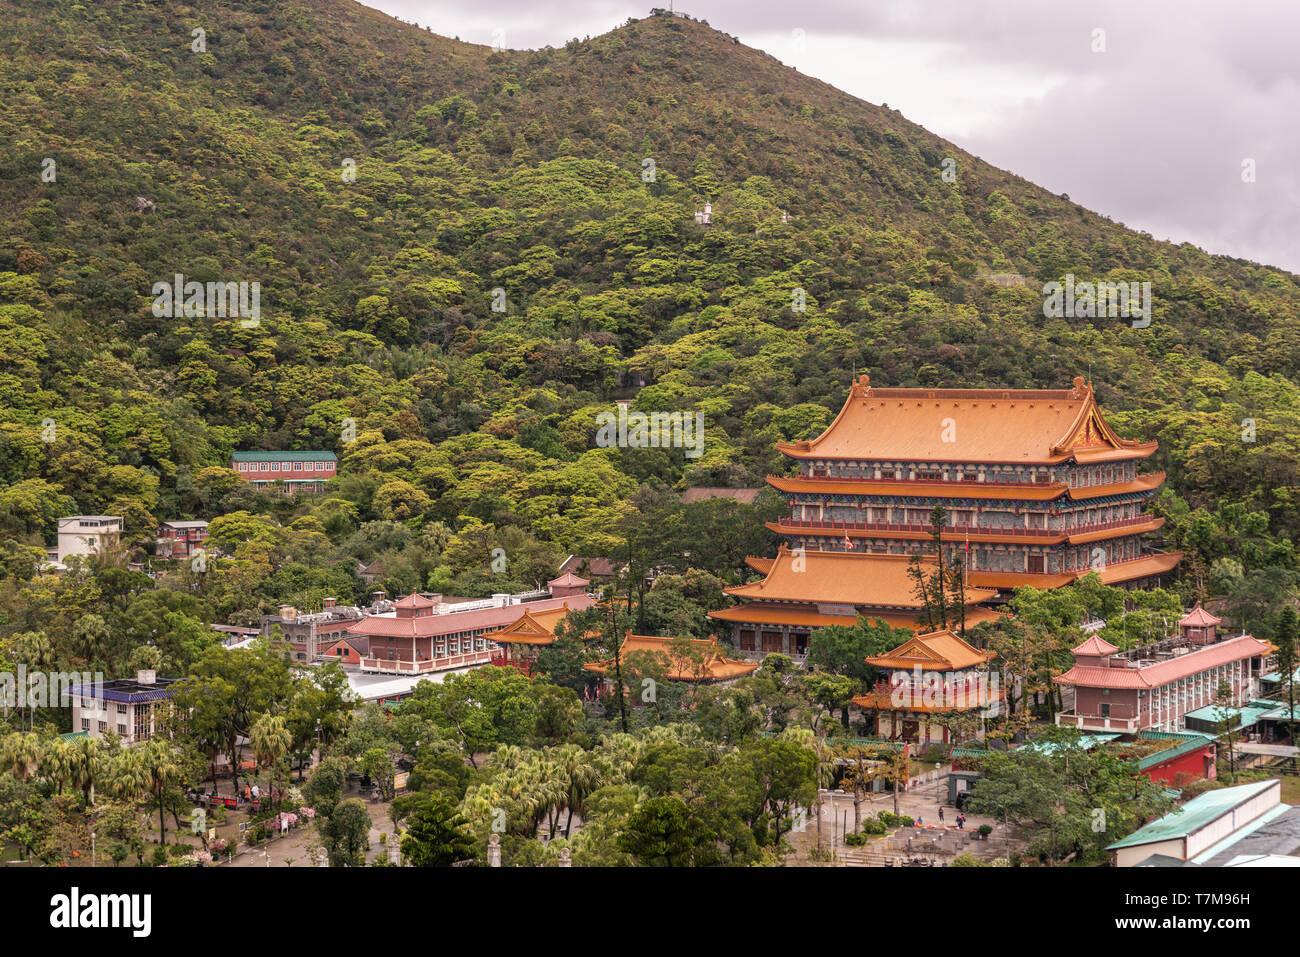 Hong Kong, China - March 7, 2019: Lantau Island. Po Lin Buddhist Monastery seen from platform at Tian Tan Buddha statue. Red roofs between trees and g - Stock Image